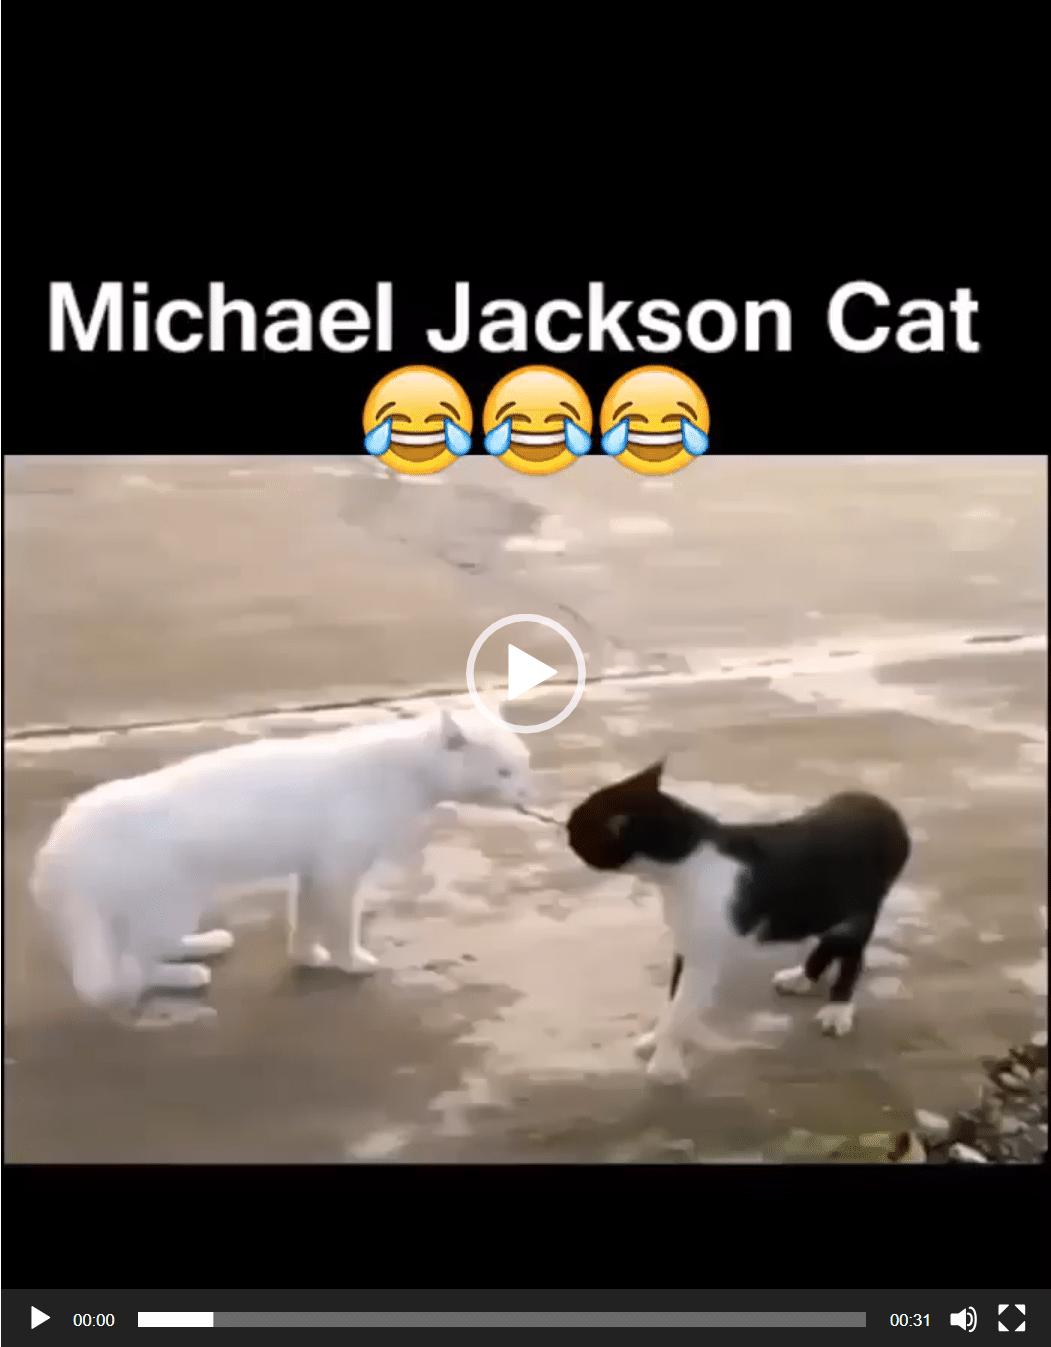 Michael Jackson Cat